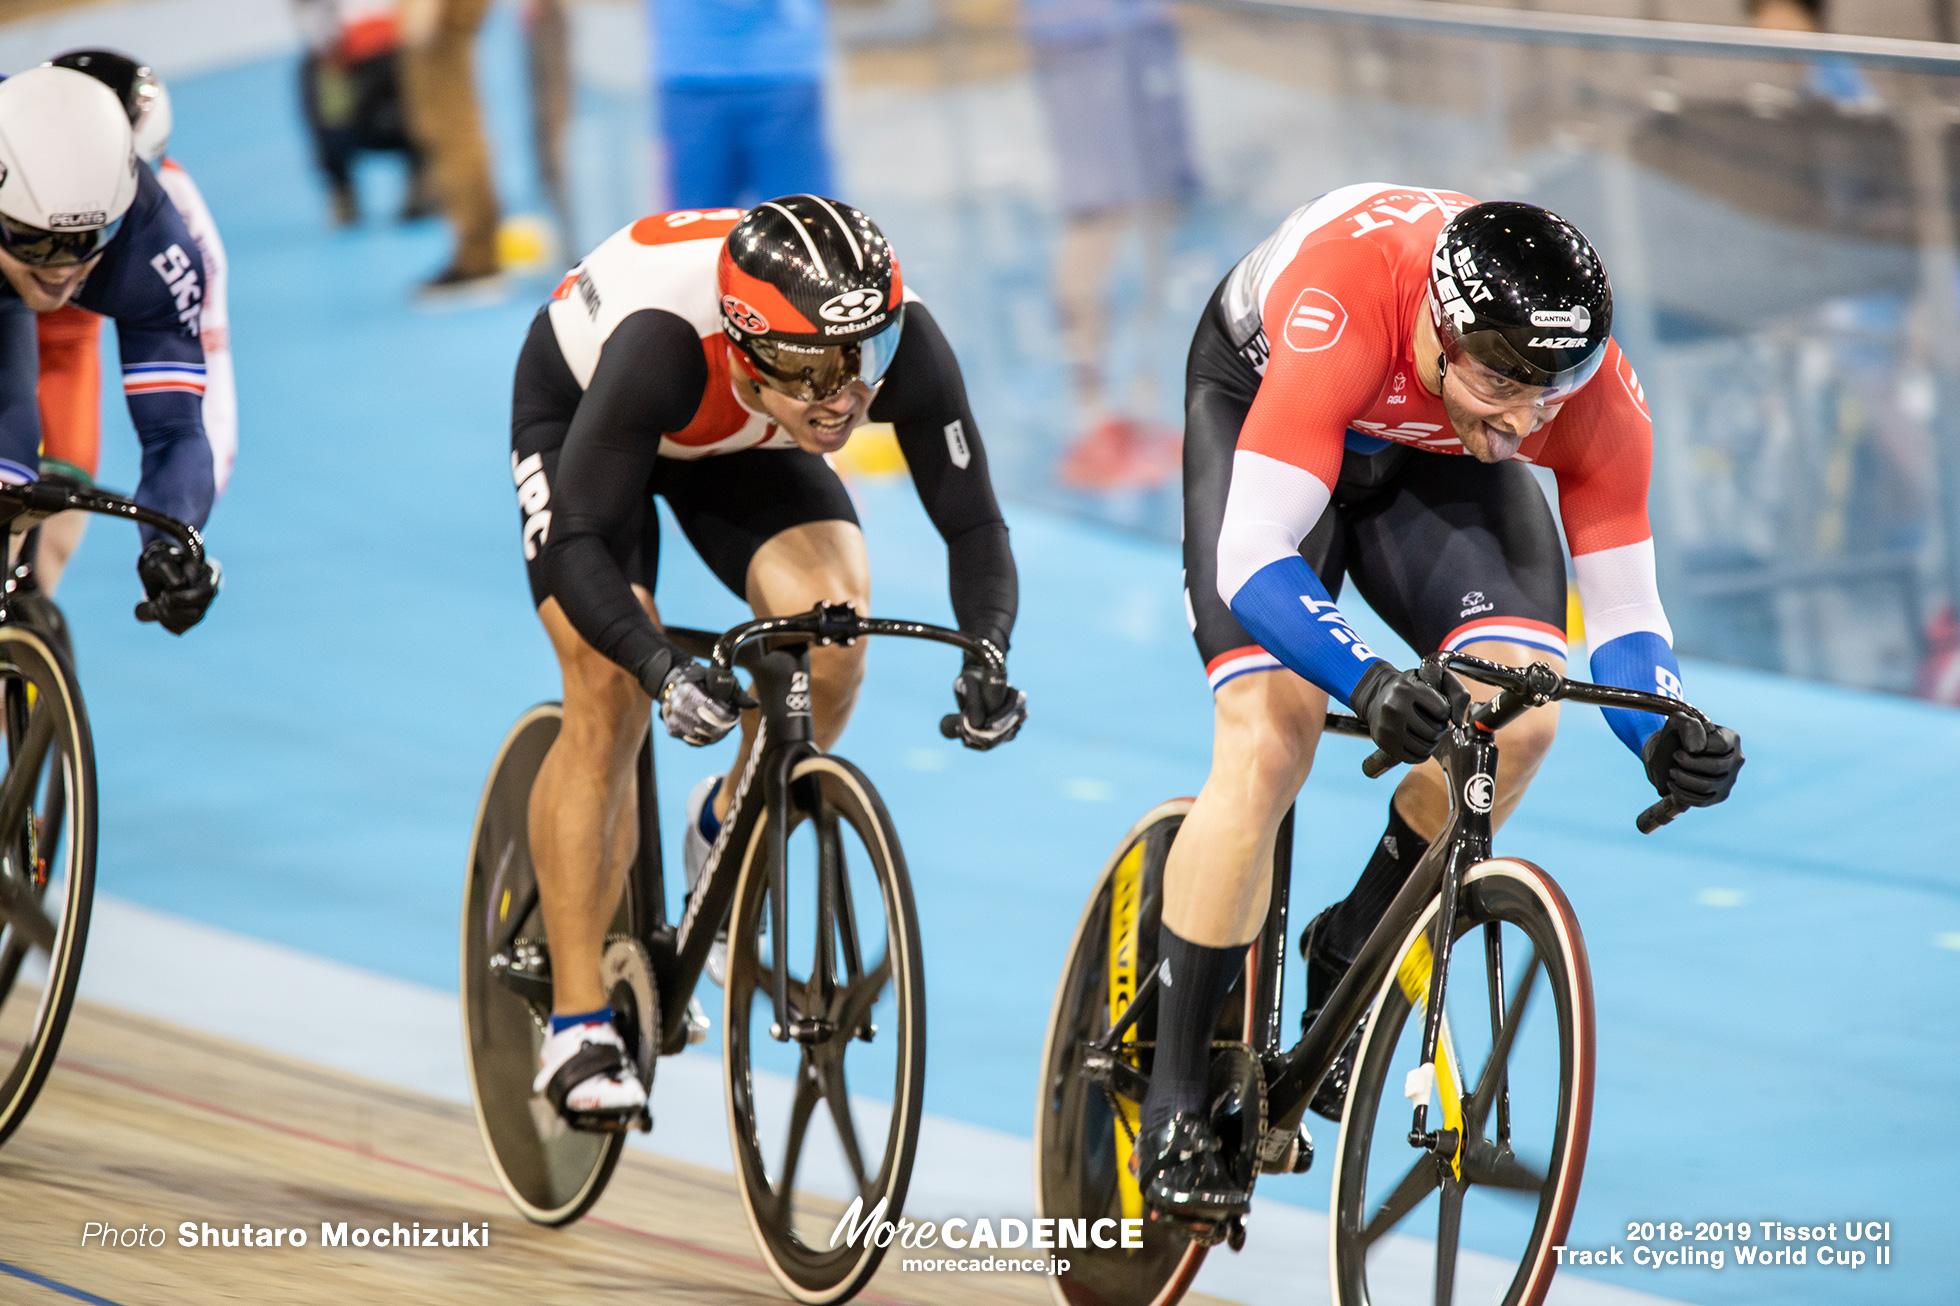 2018-2019 Tissot UCI Track Cycling World Cup II Men's Keirin Qualifying Heat3